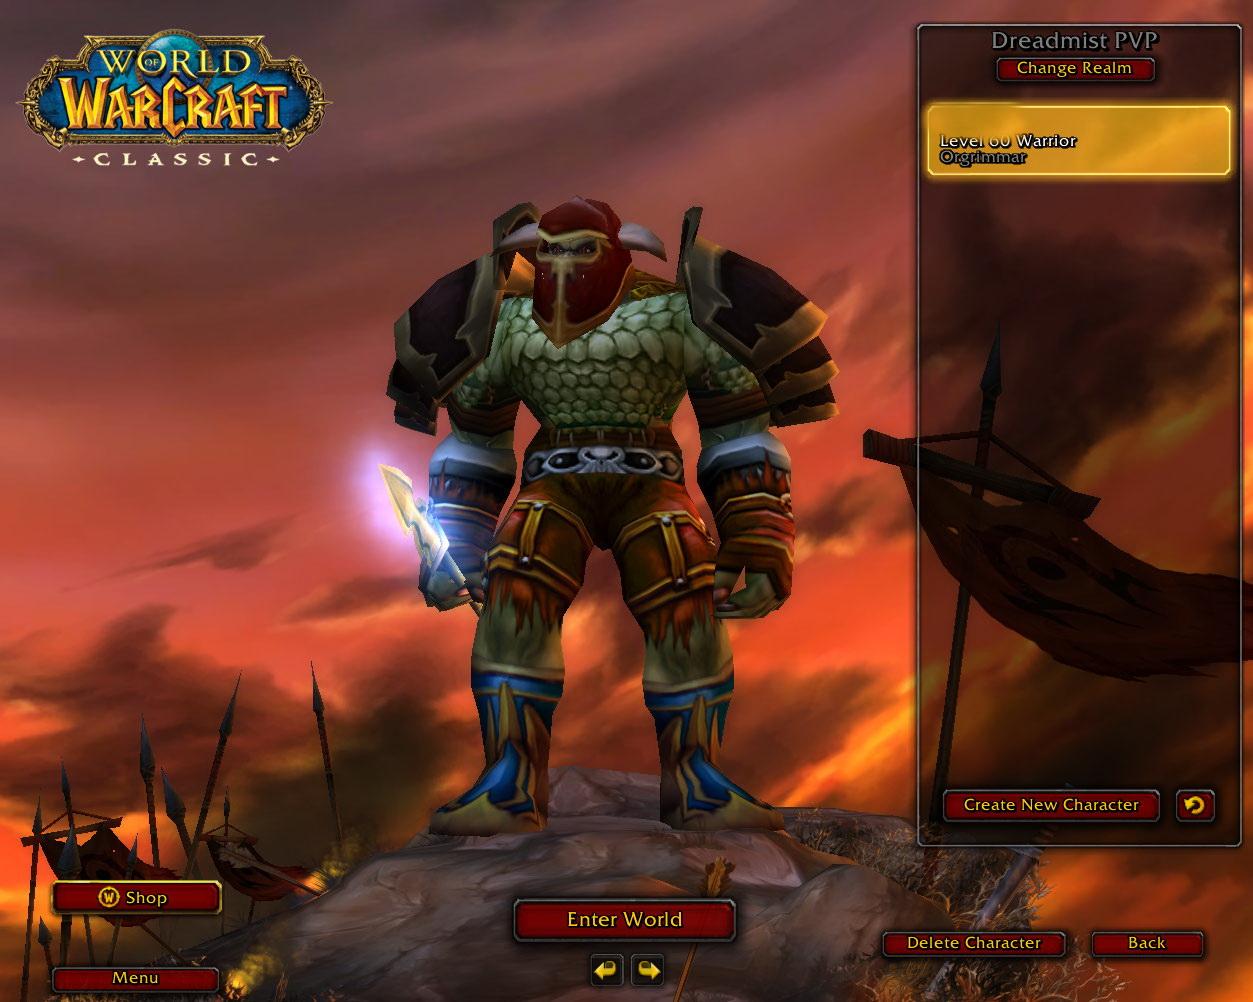 EU Classic account. Lvl 60 Warrior. Gold: 52. 5 BiS items! Attunements:Mara, PVP Rank 2. Mount:60%